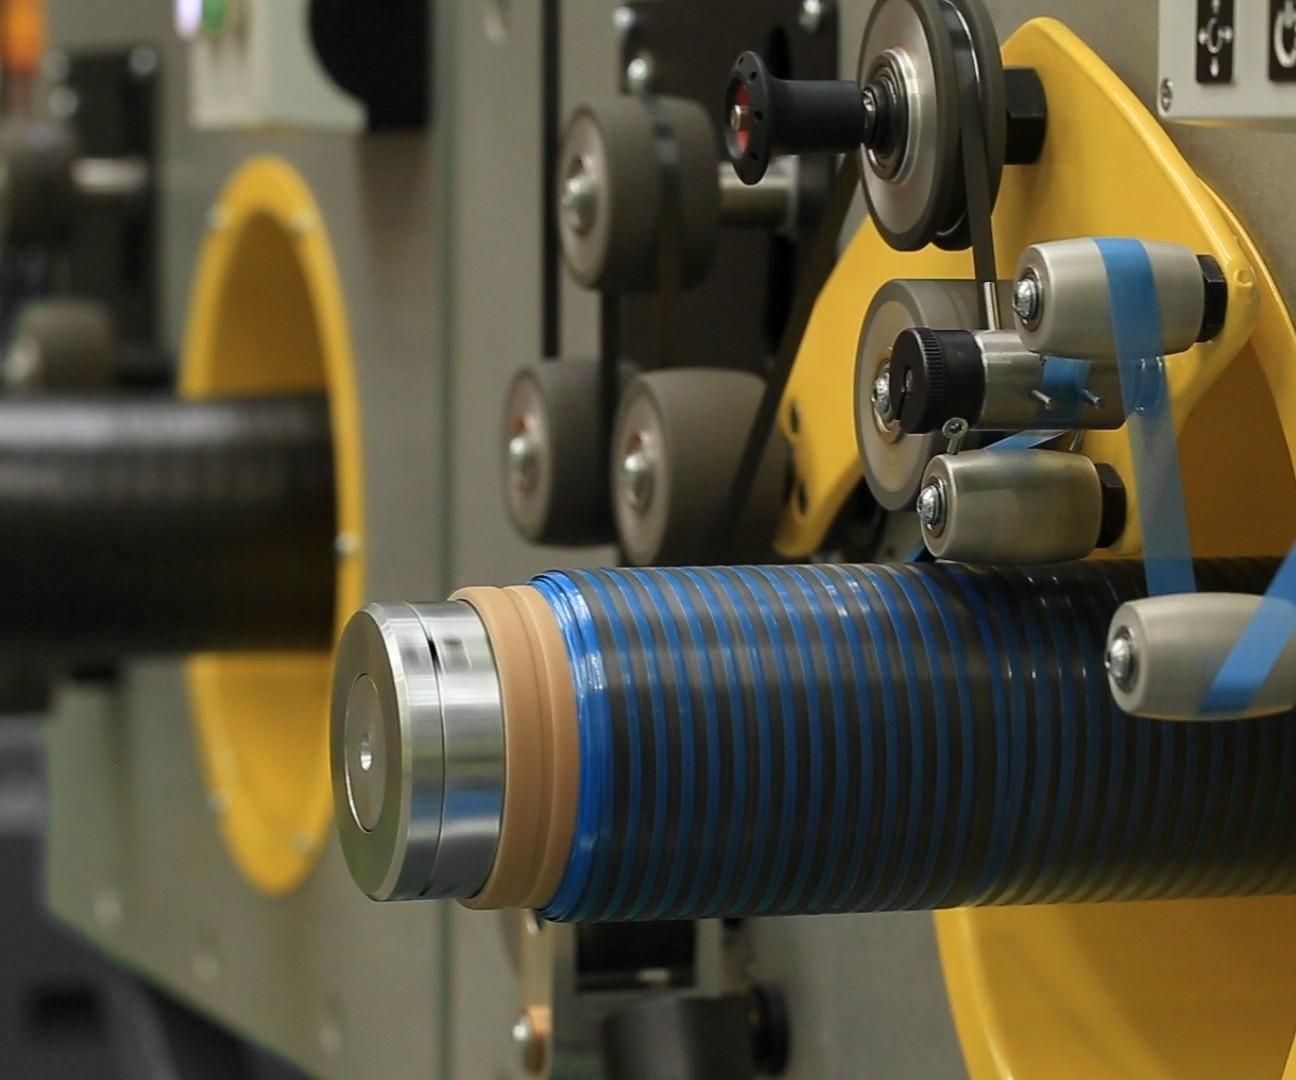 Cygnet Texkimp slitter-spooler machine carbon fiber prepreg spooling head with poly interleaf insertion